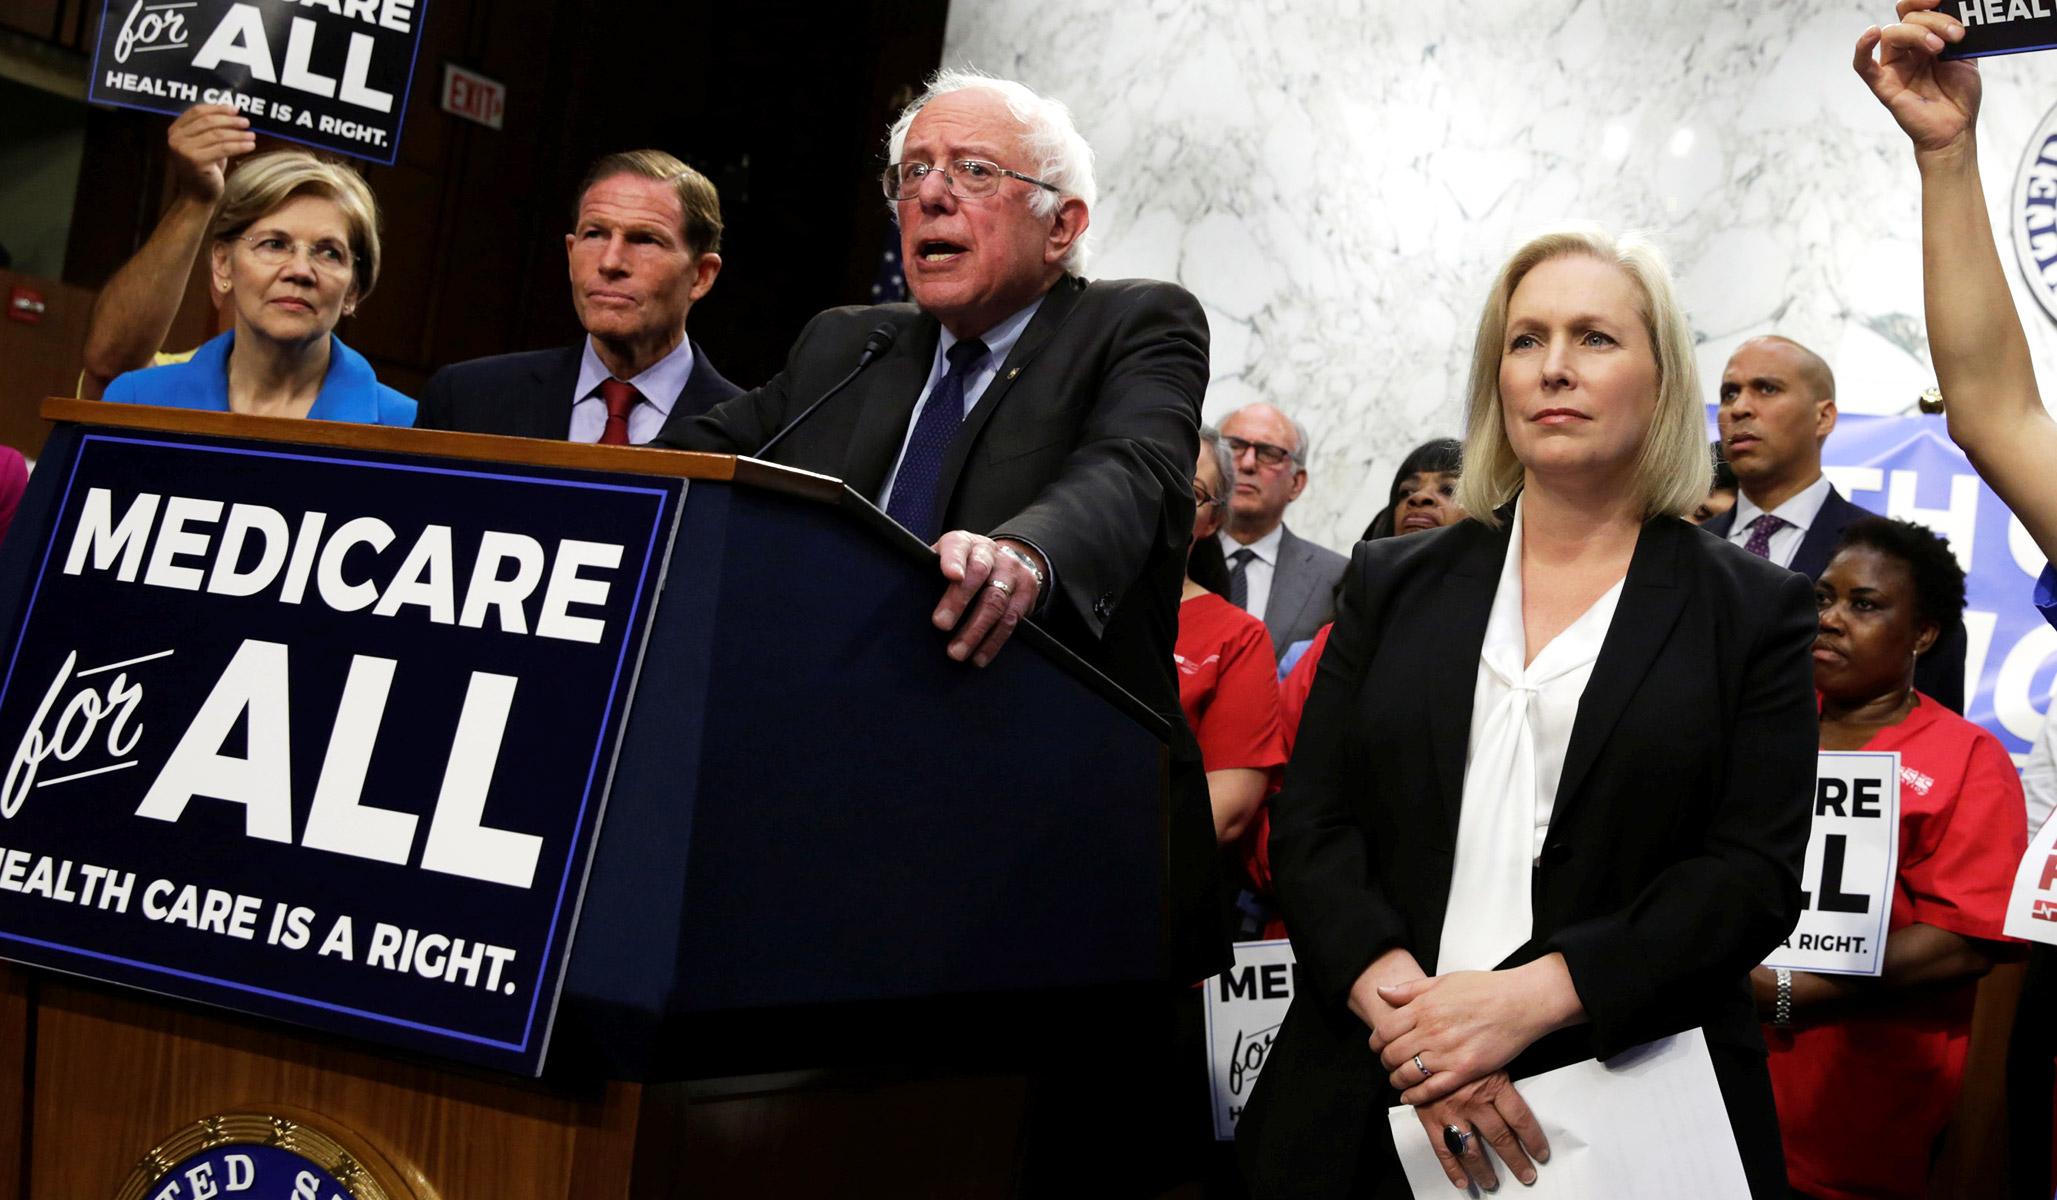 nationalreview.com - Alexandra DeSanctis - Medicare for All Bill Mandates Abortion Coverage